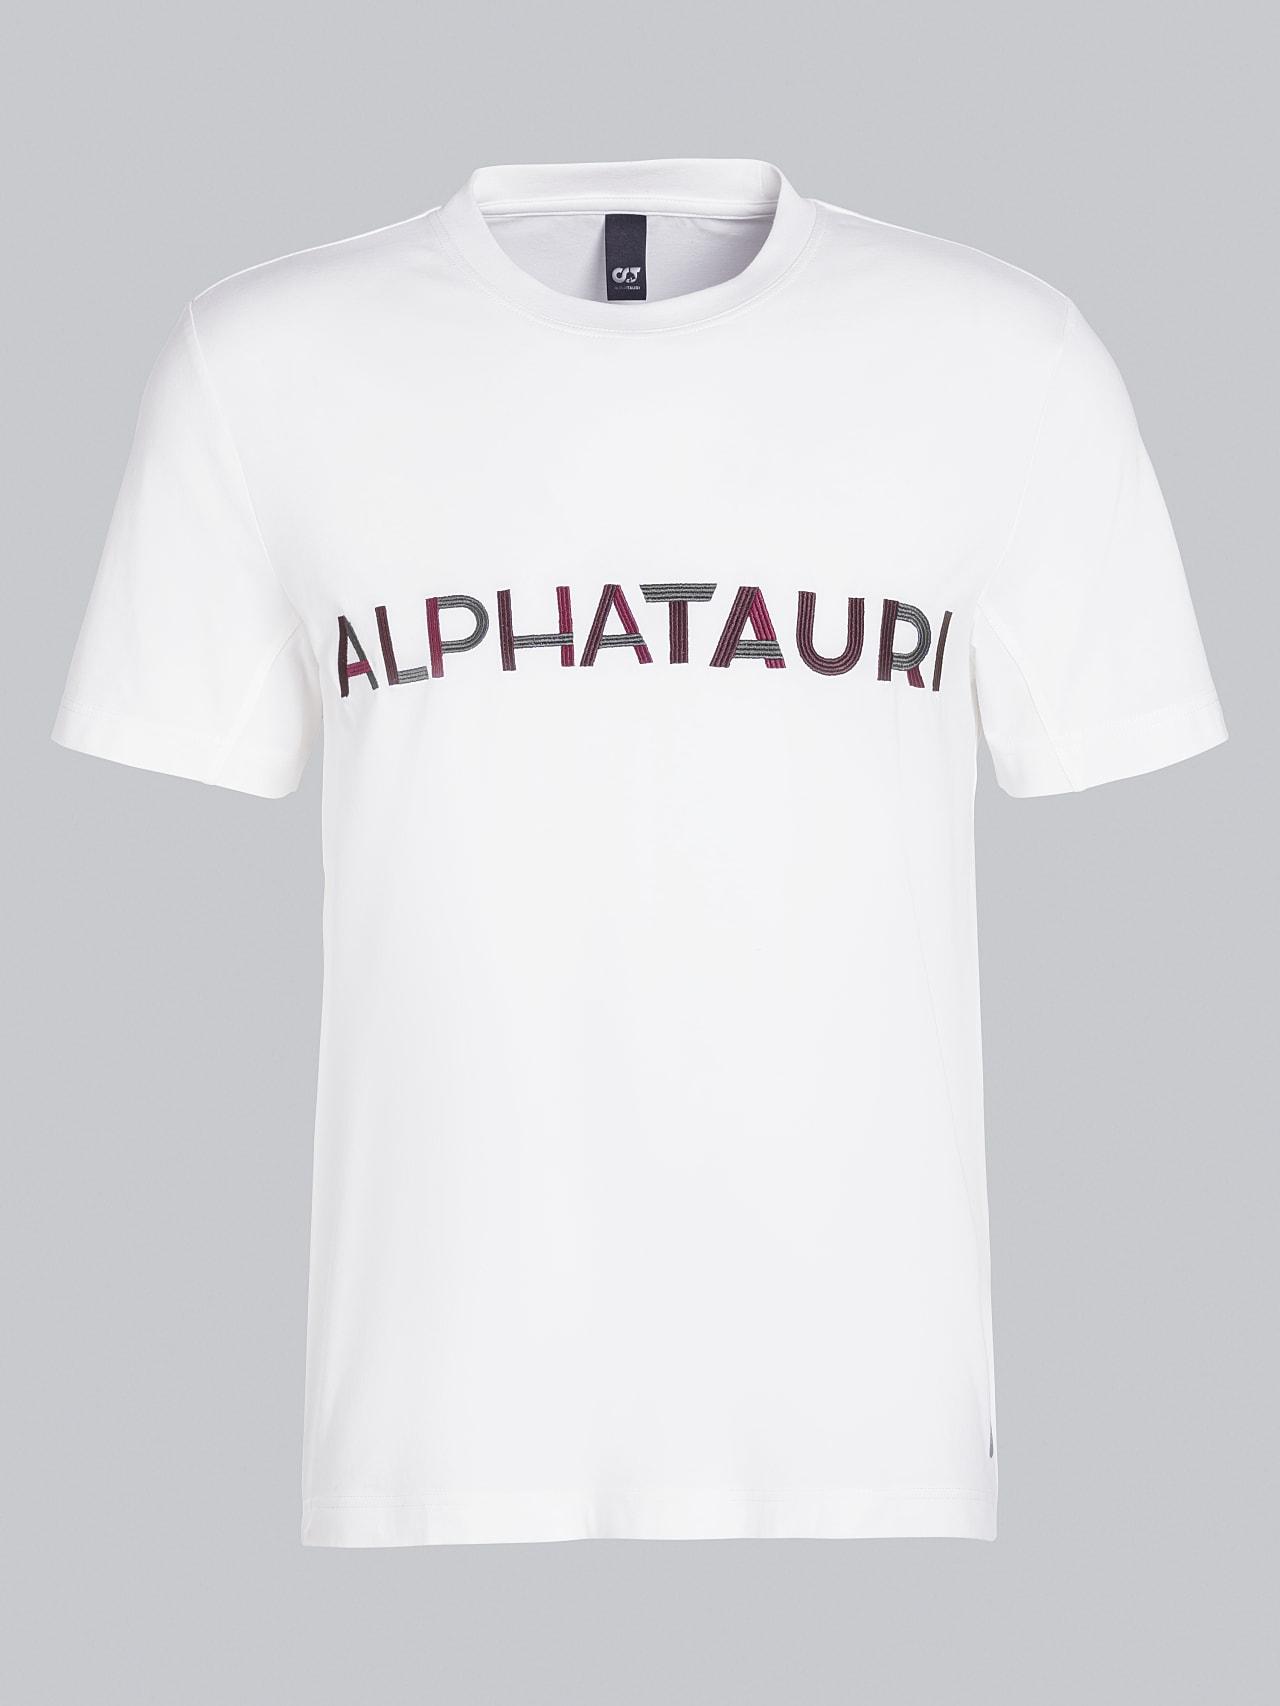 JANOS V3.Y5.02 Logo Embroidery T-Shirt offwhite Back Alpha Tauri